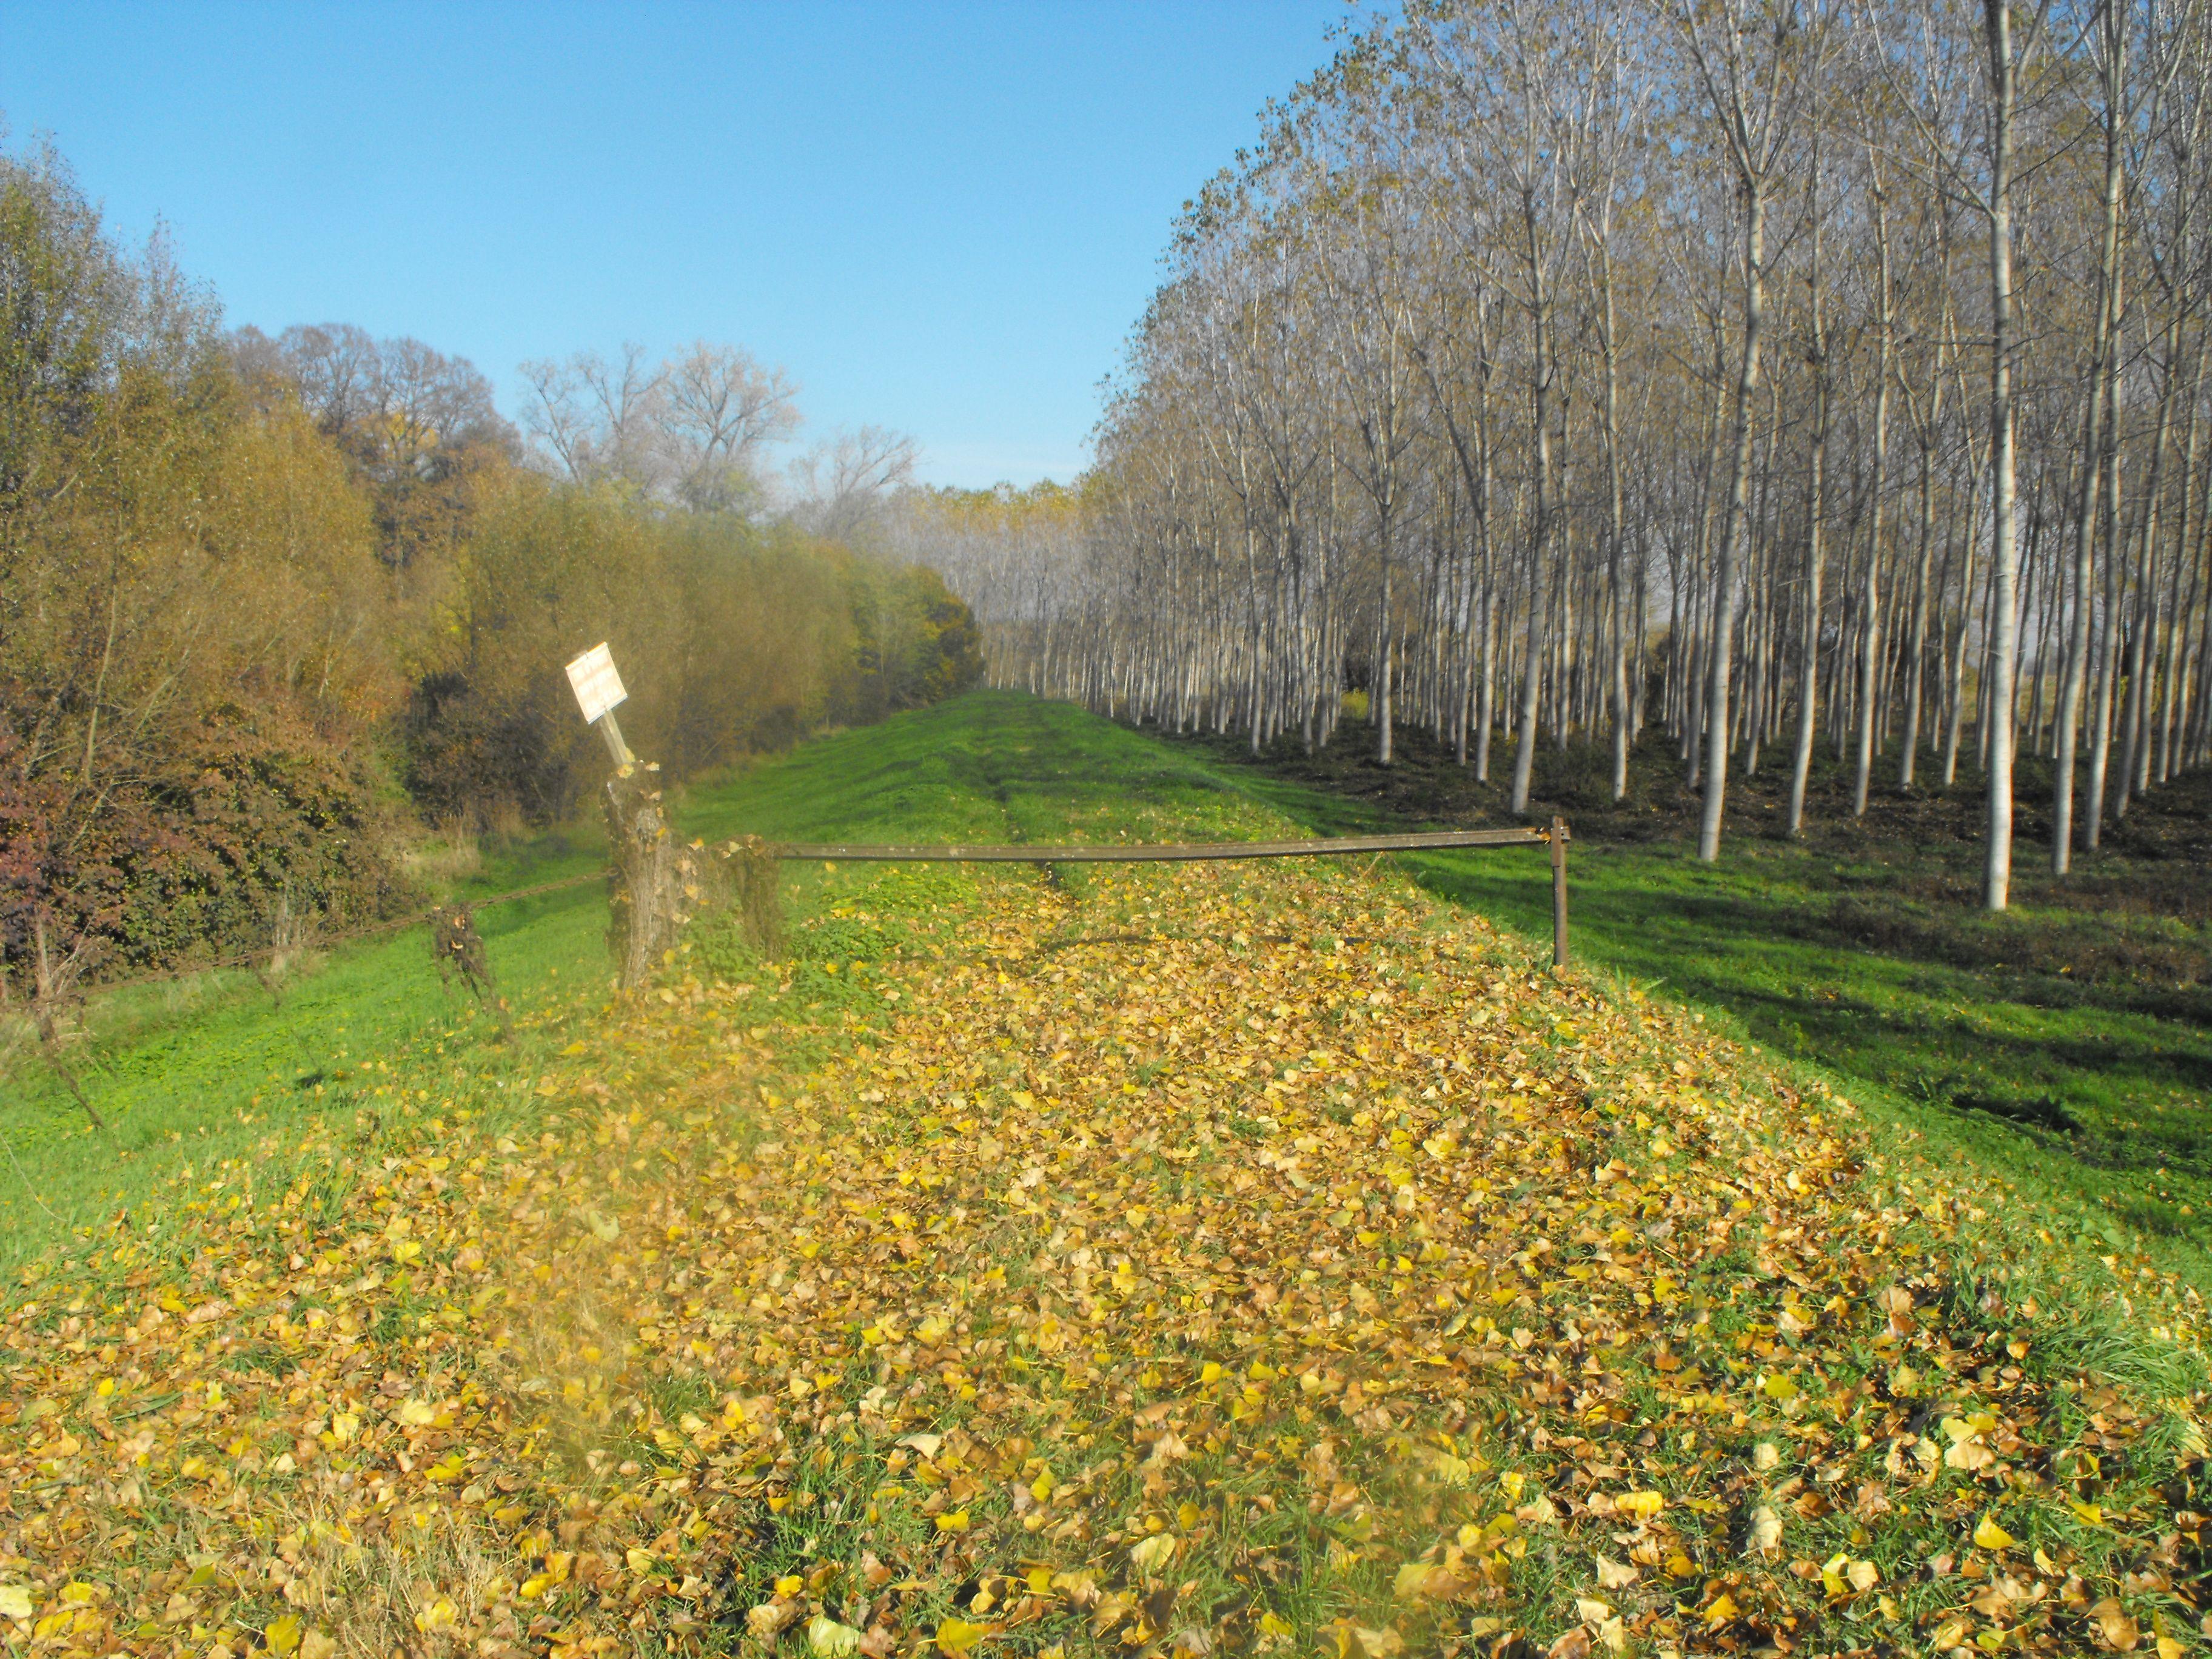 Bosco nella Golena del Po - Woods near the Po river | 30 min by bike - 60 min by foot - 10 min by car